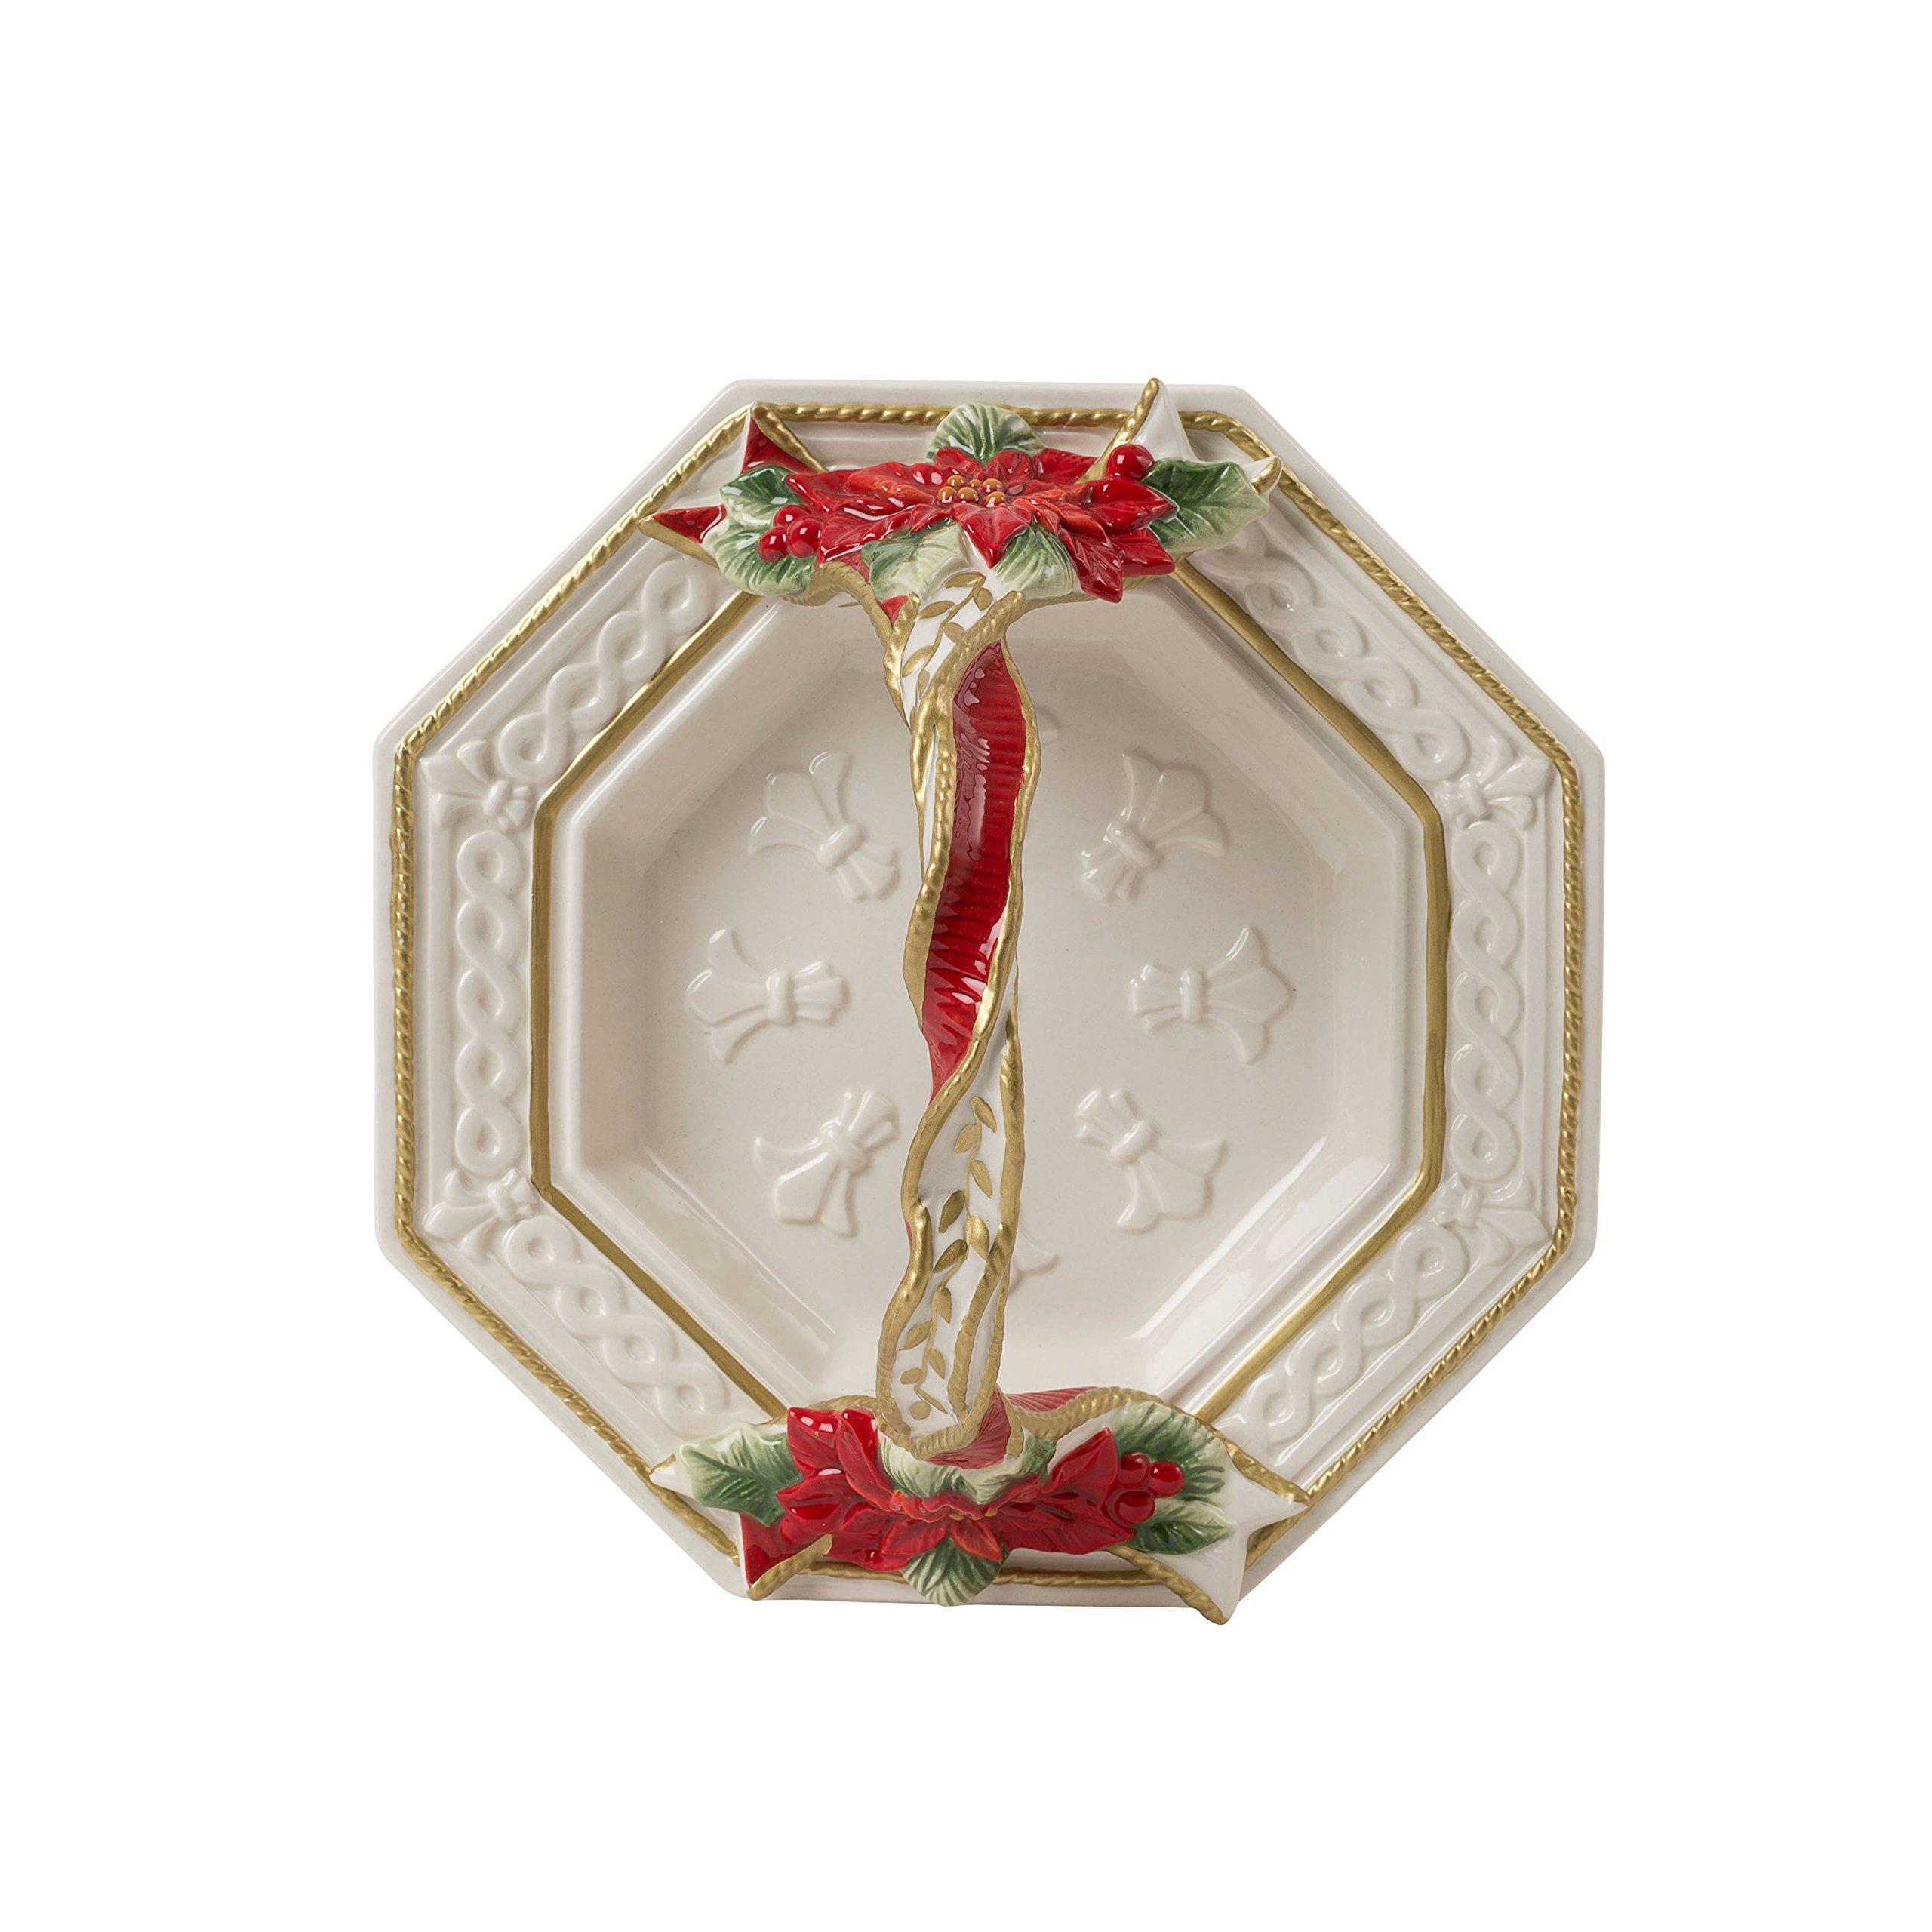 Fitz and Floyd 49-358 Poinsettia Santa Bread Basket, Red White